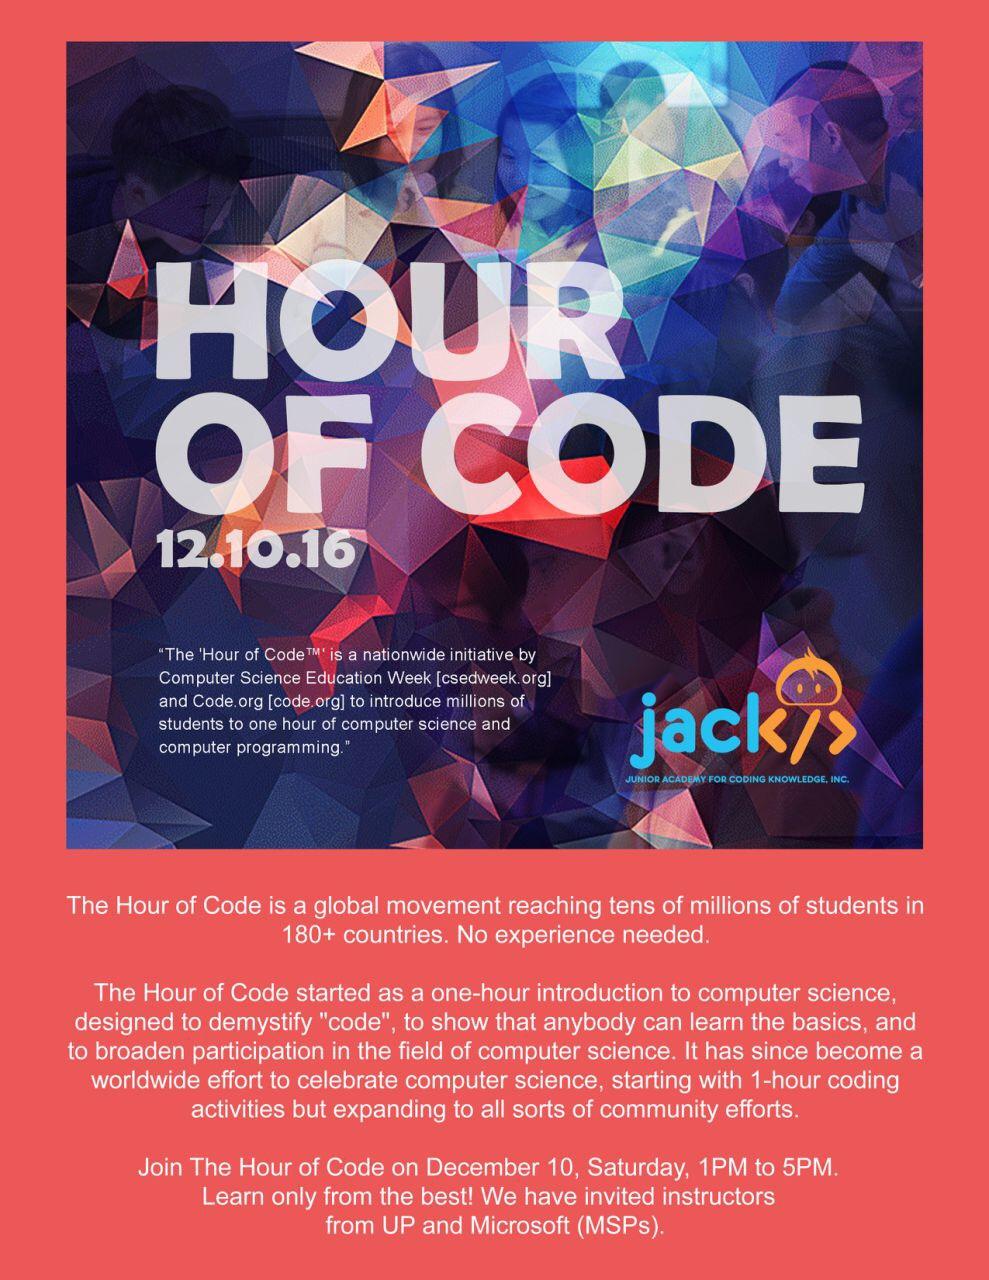 hour-of-code-invite